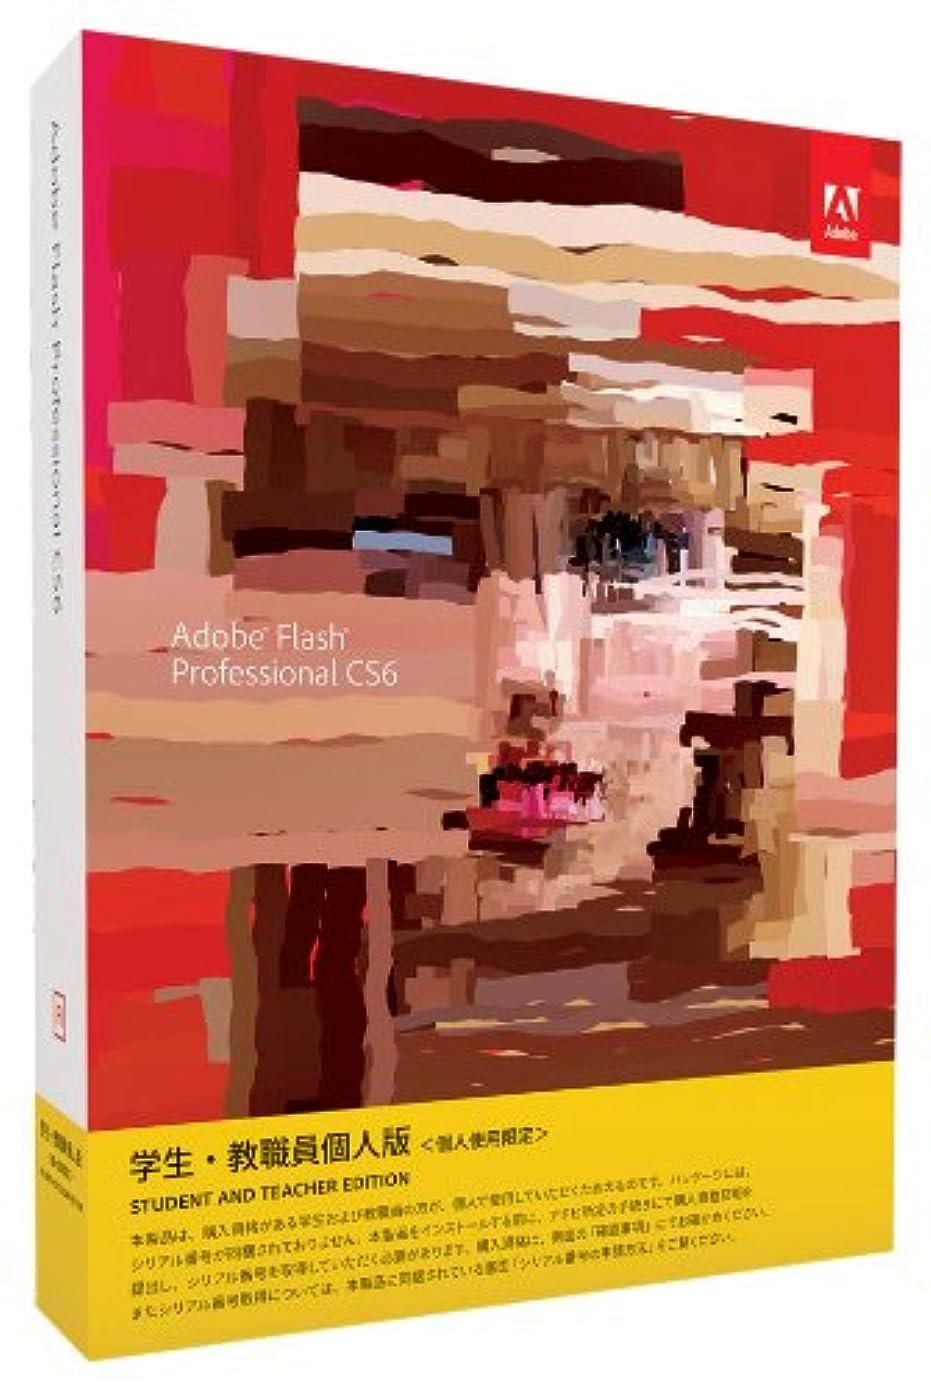 学生?教職員個人版 Adobe Flash Professional CS6 Macintosh版 (要シリアル番号申請)